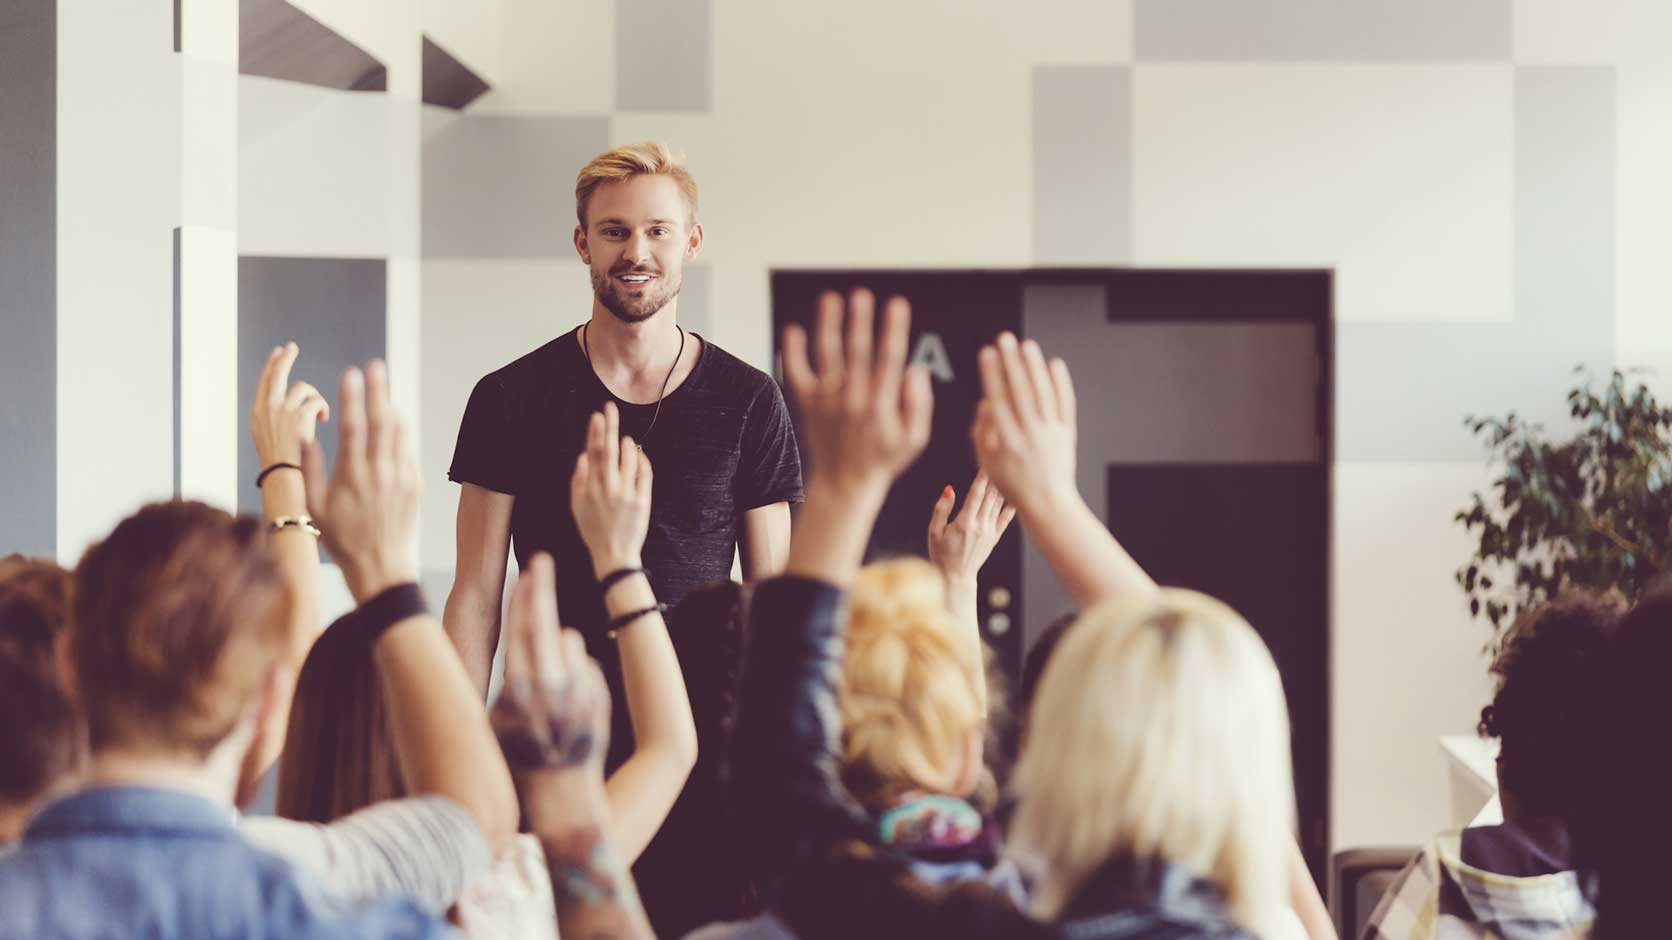 future of marketing - better engagement